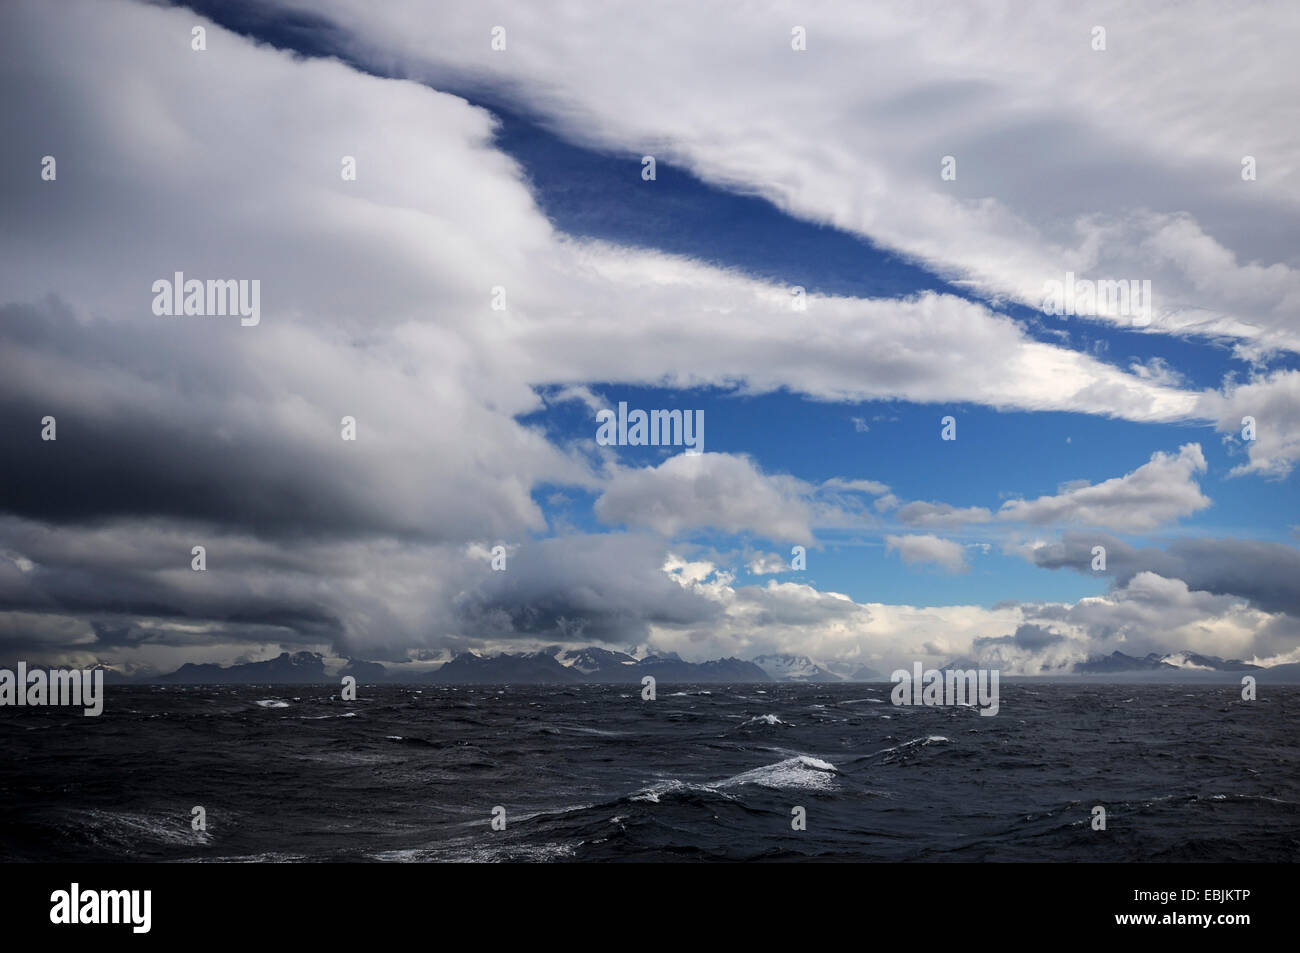 South Georgia in the Southern Ocean, Antarctica, Suedgeorgien - Stock Image